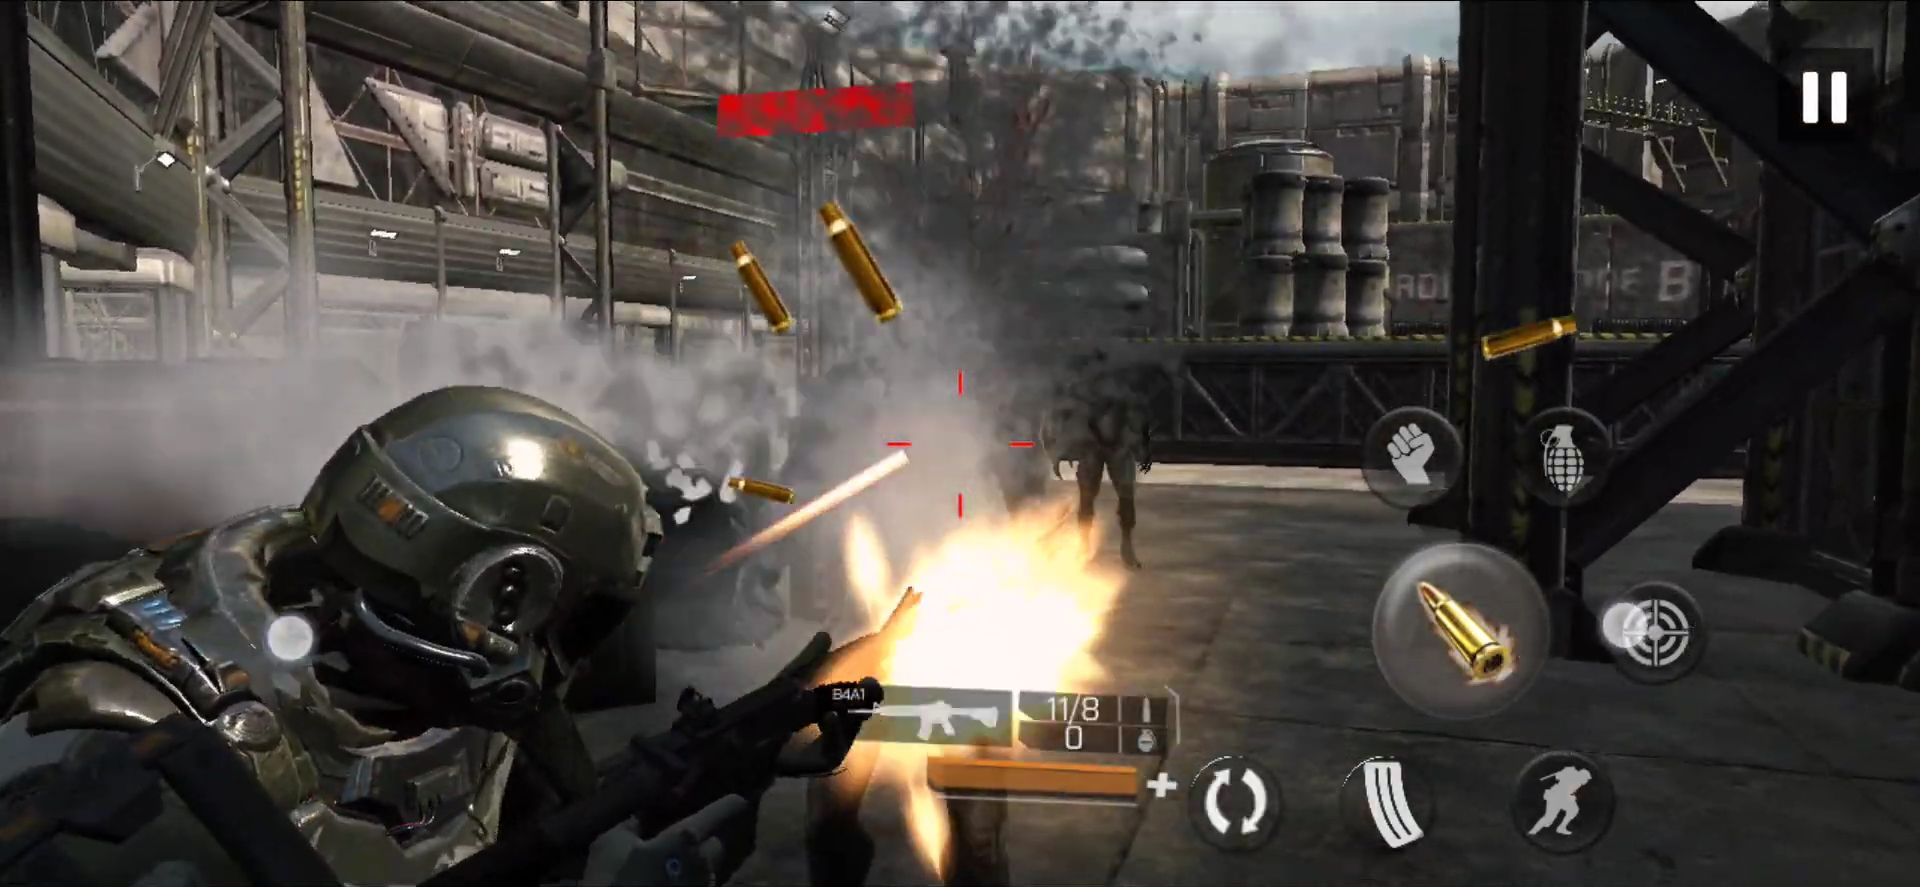 Dead Zone - Action TPS Screenshot